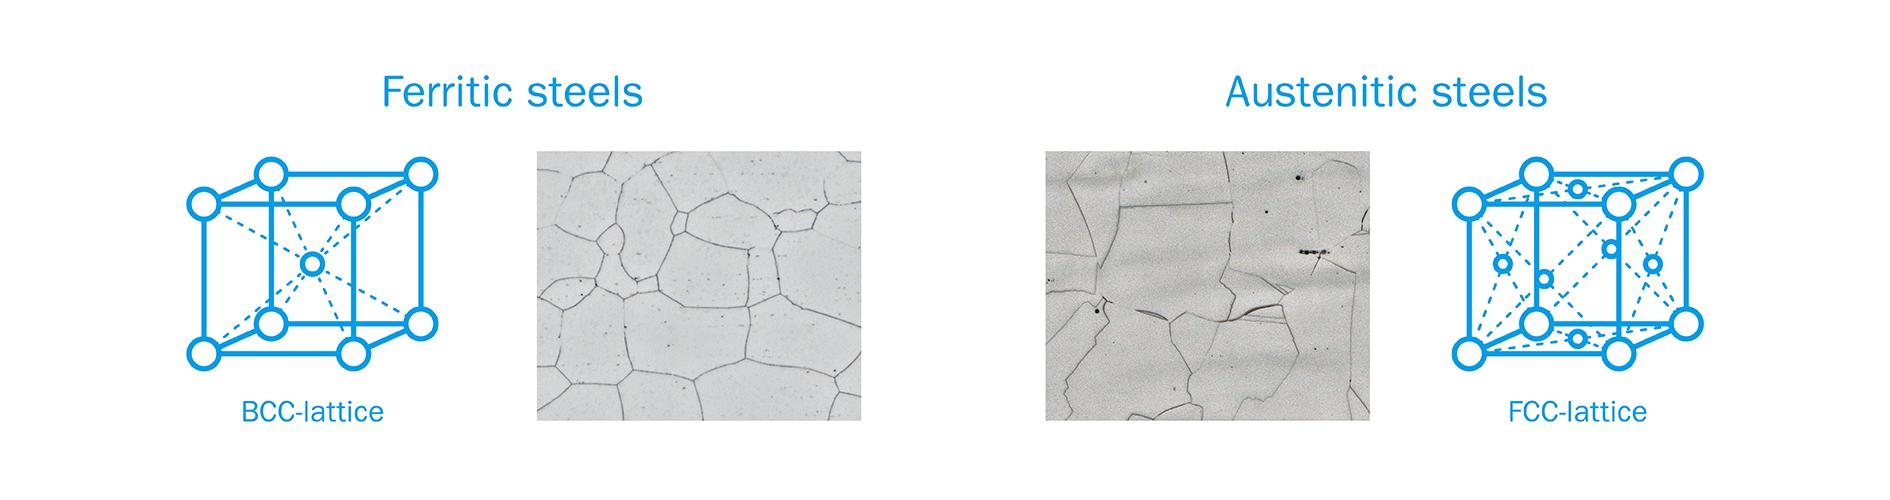 Ferritic steels and austenitic steels comparison